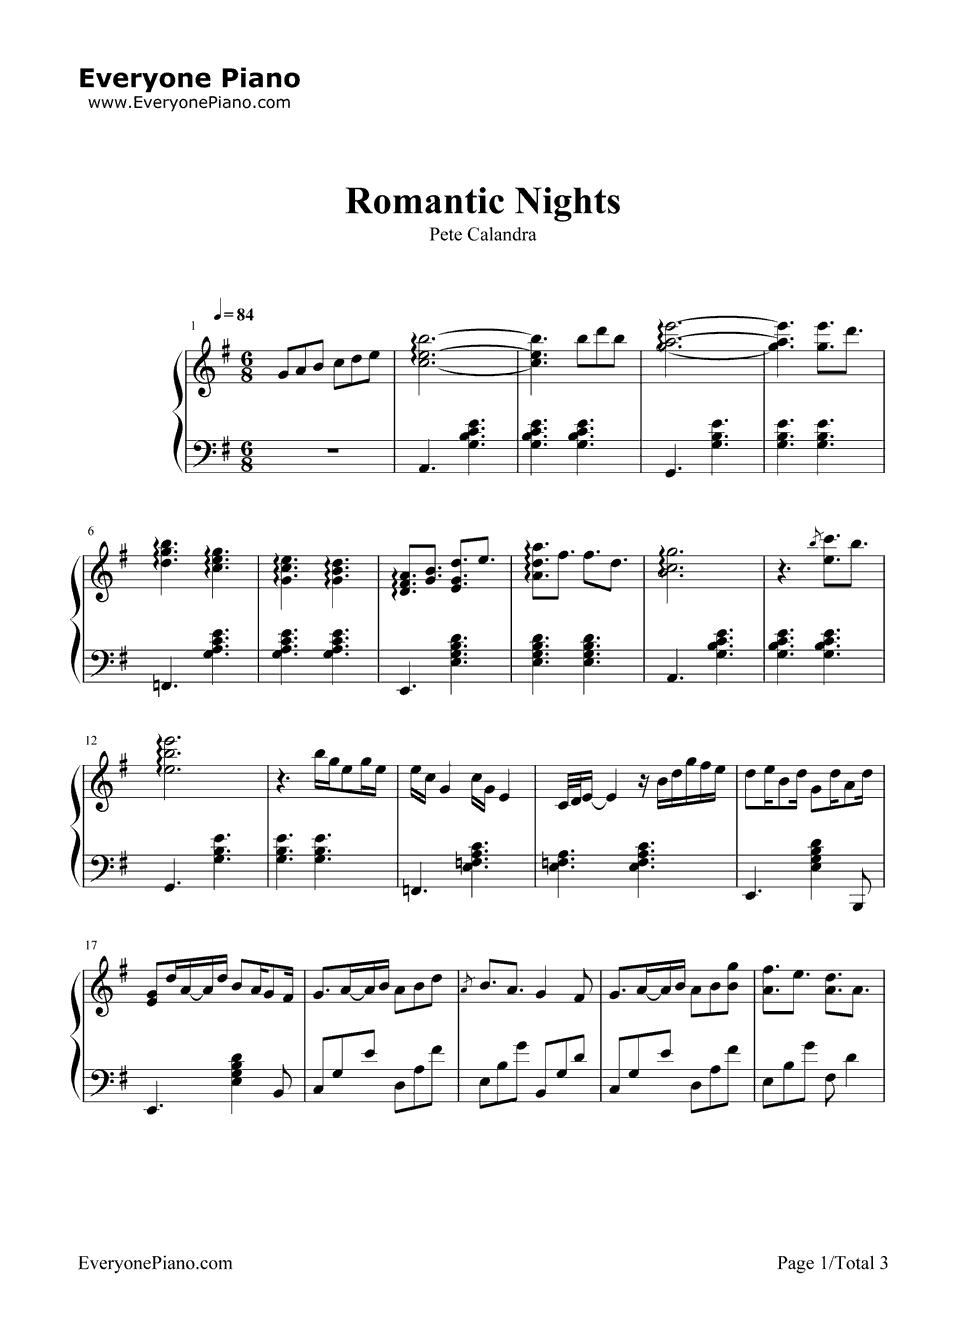 《Romantic Nights》(爱情公寓插曲)钢琴谱第1张